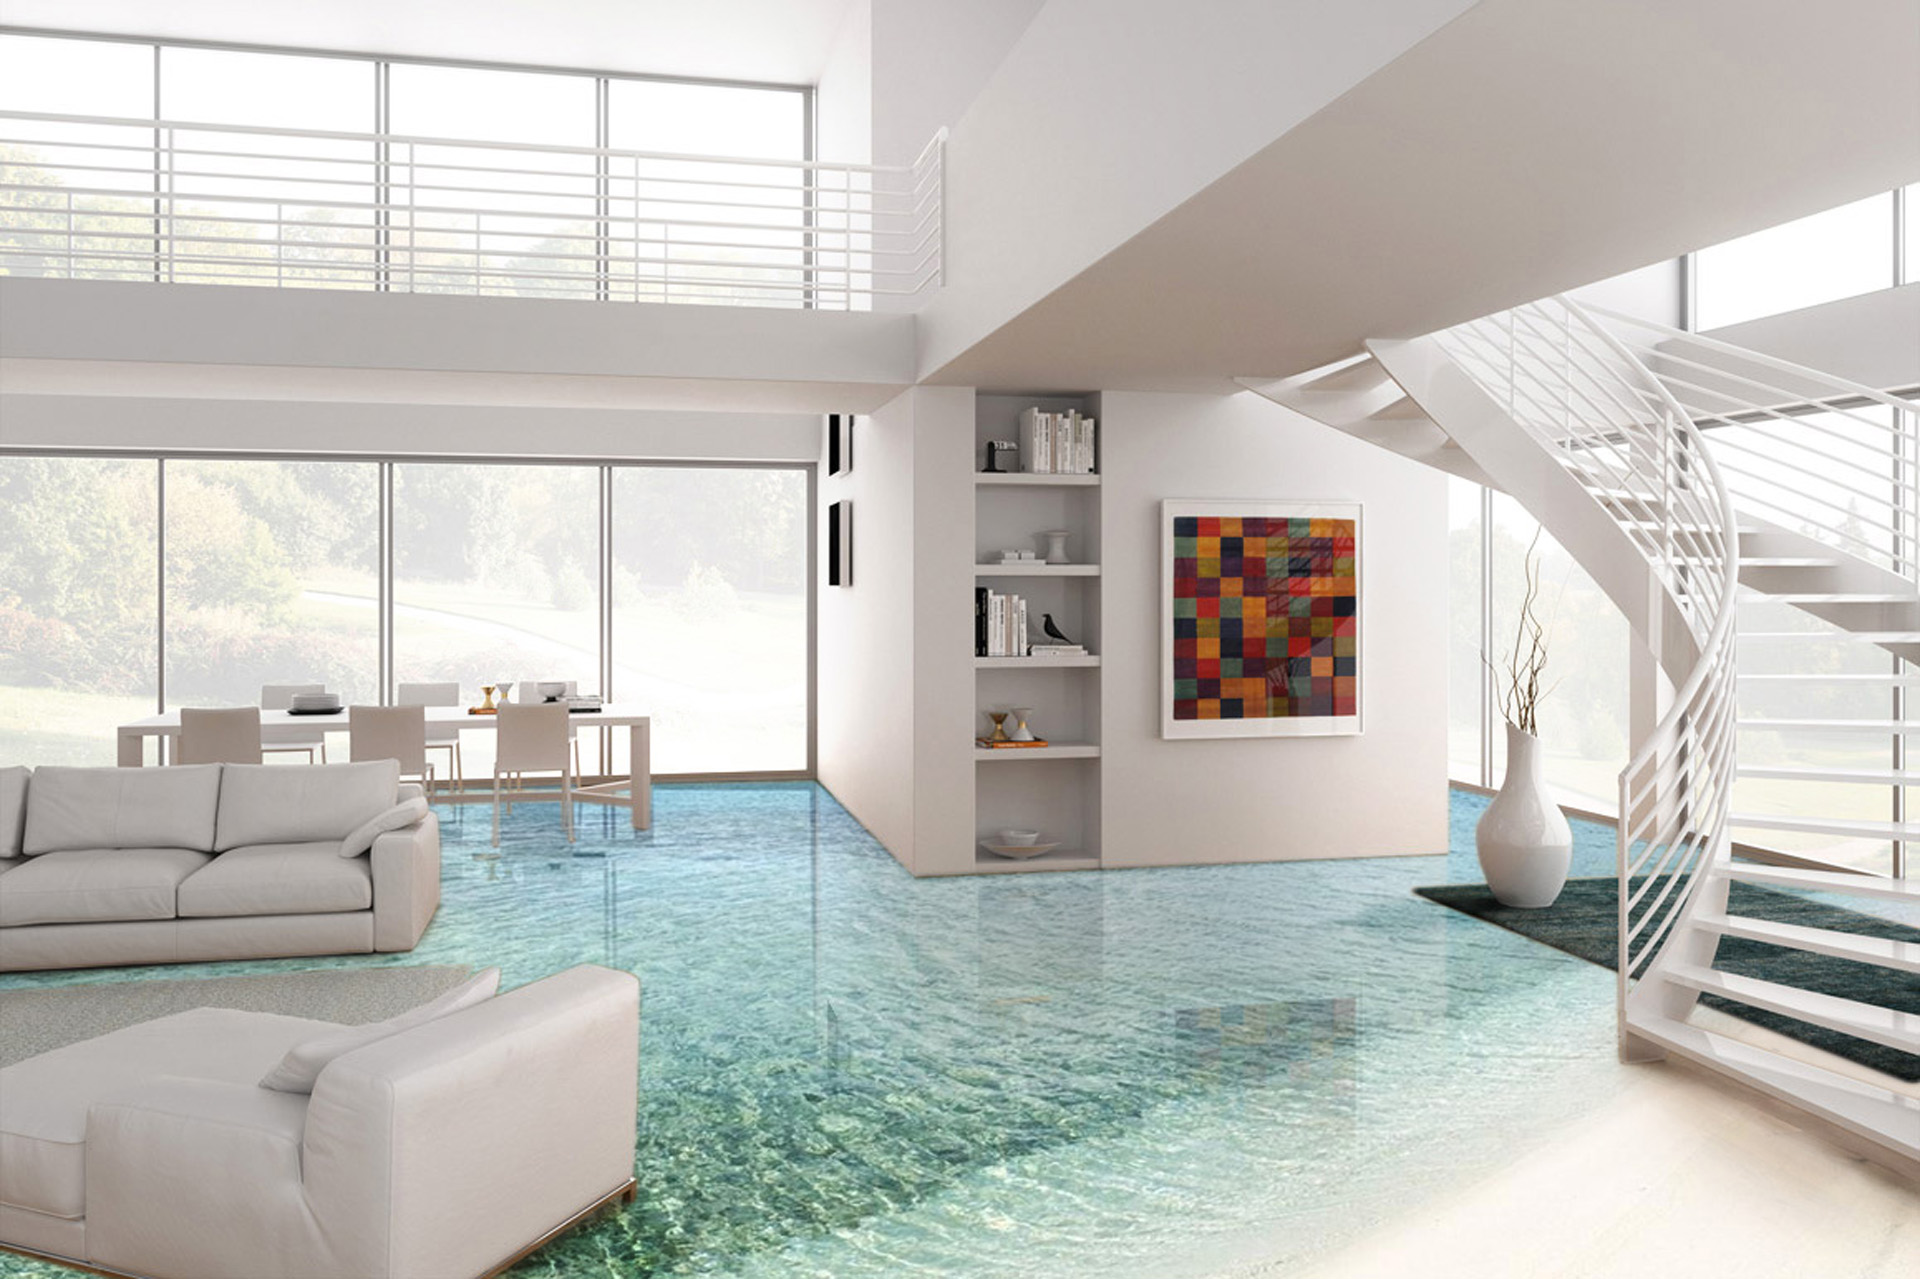 Home pavimenti 3d - Pavimenti da interno moderni ...